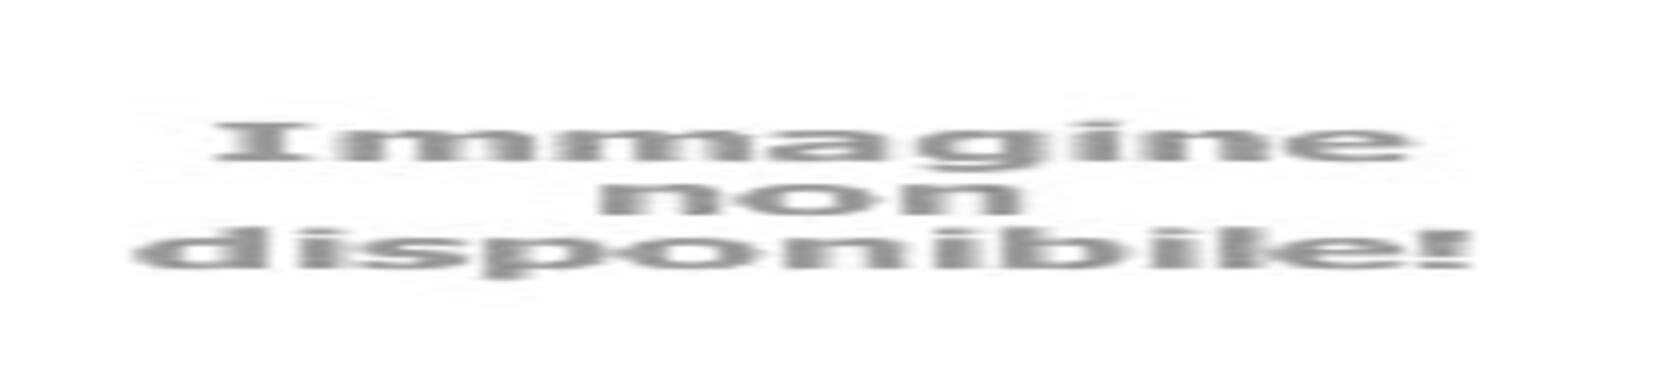 basketriminicrabs it 6-1083-video-ceccarules-n.19 005